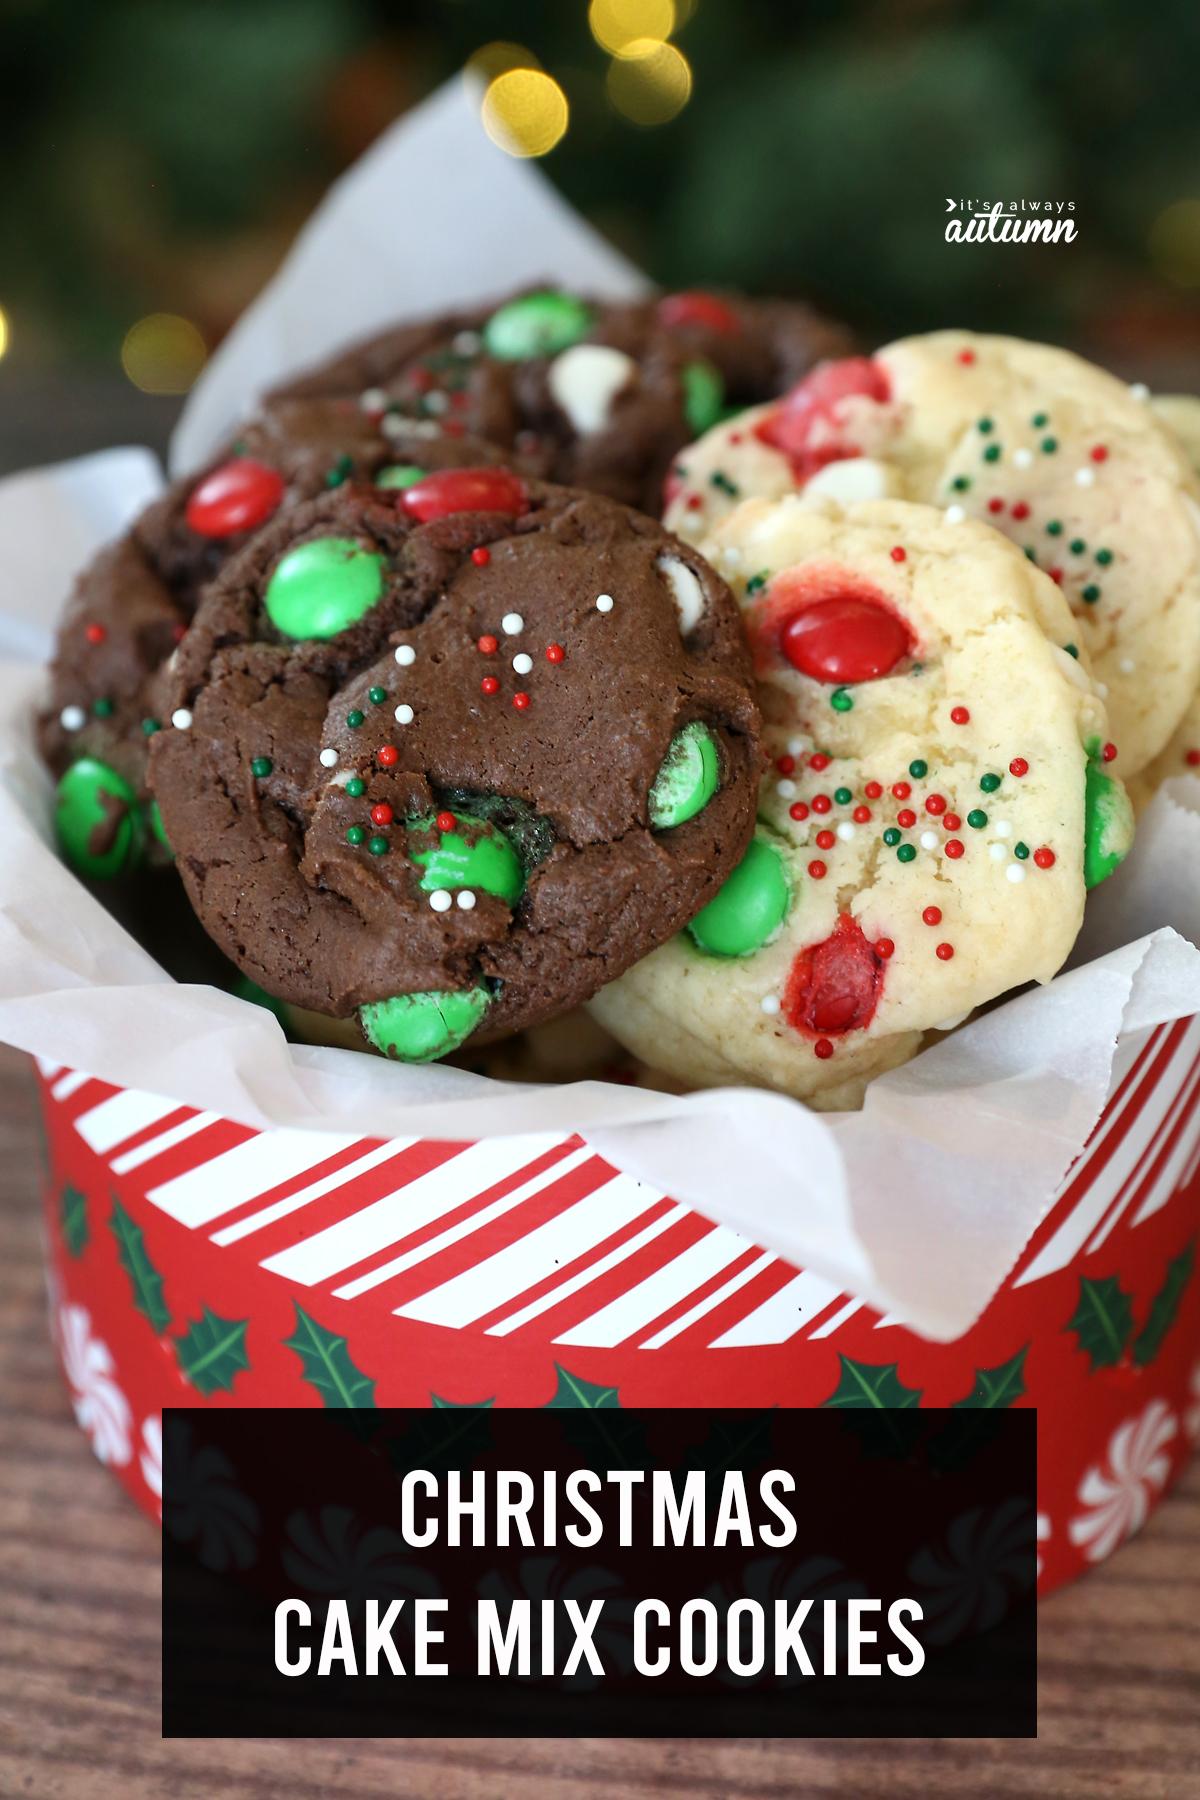 Chocolate and vanilla cake mix Christmas cookies